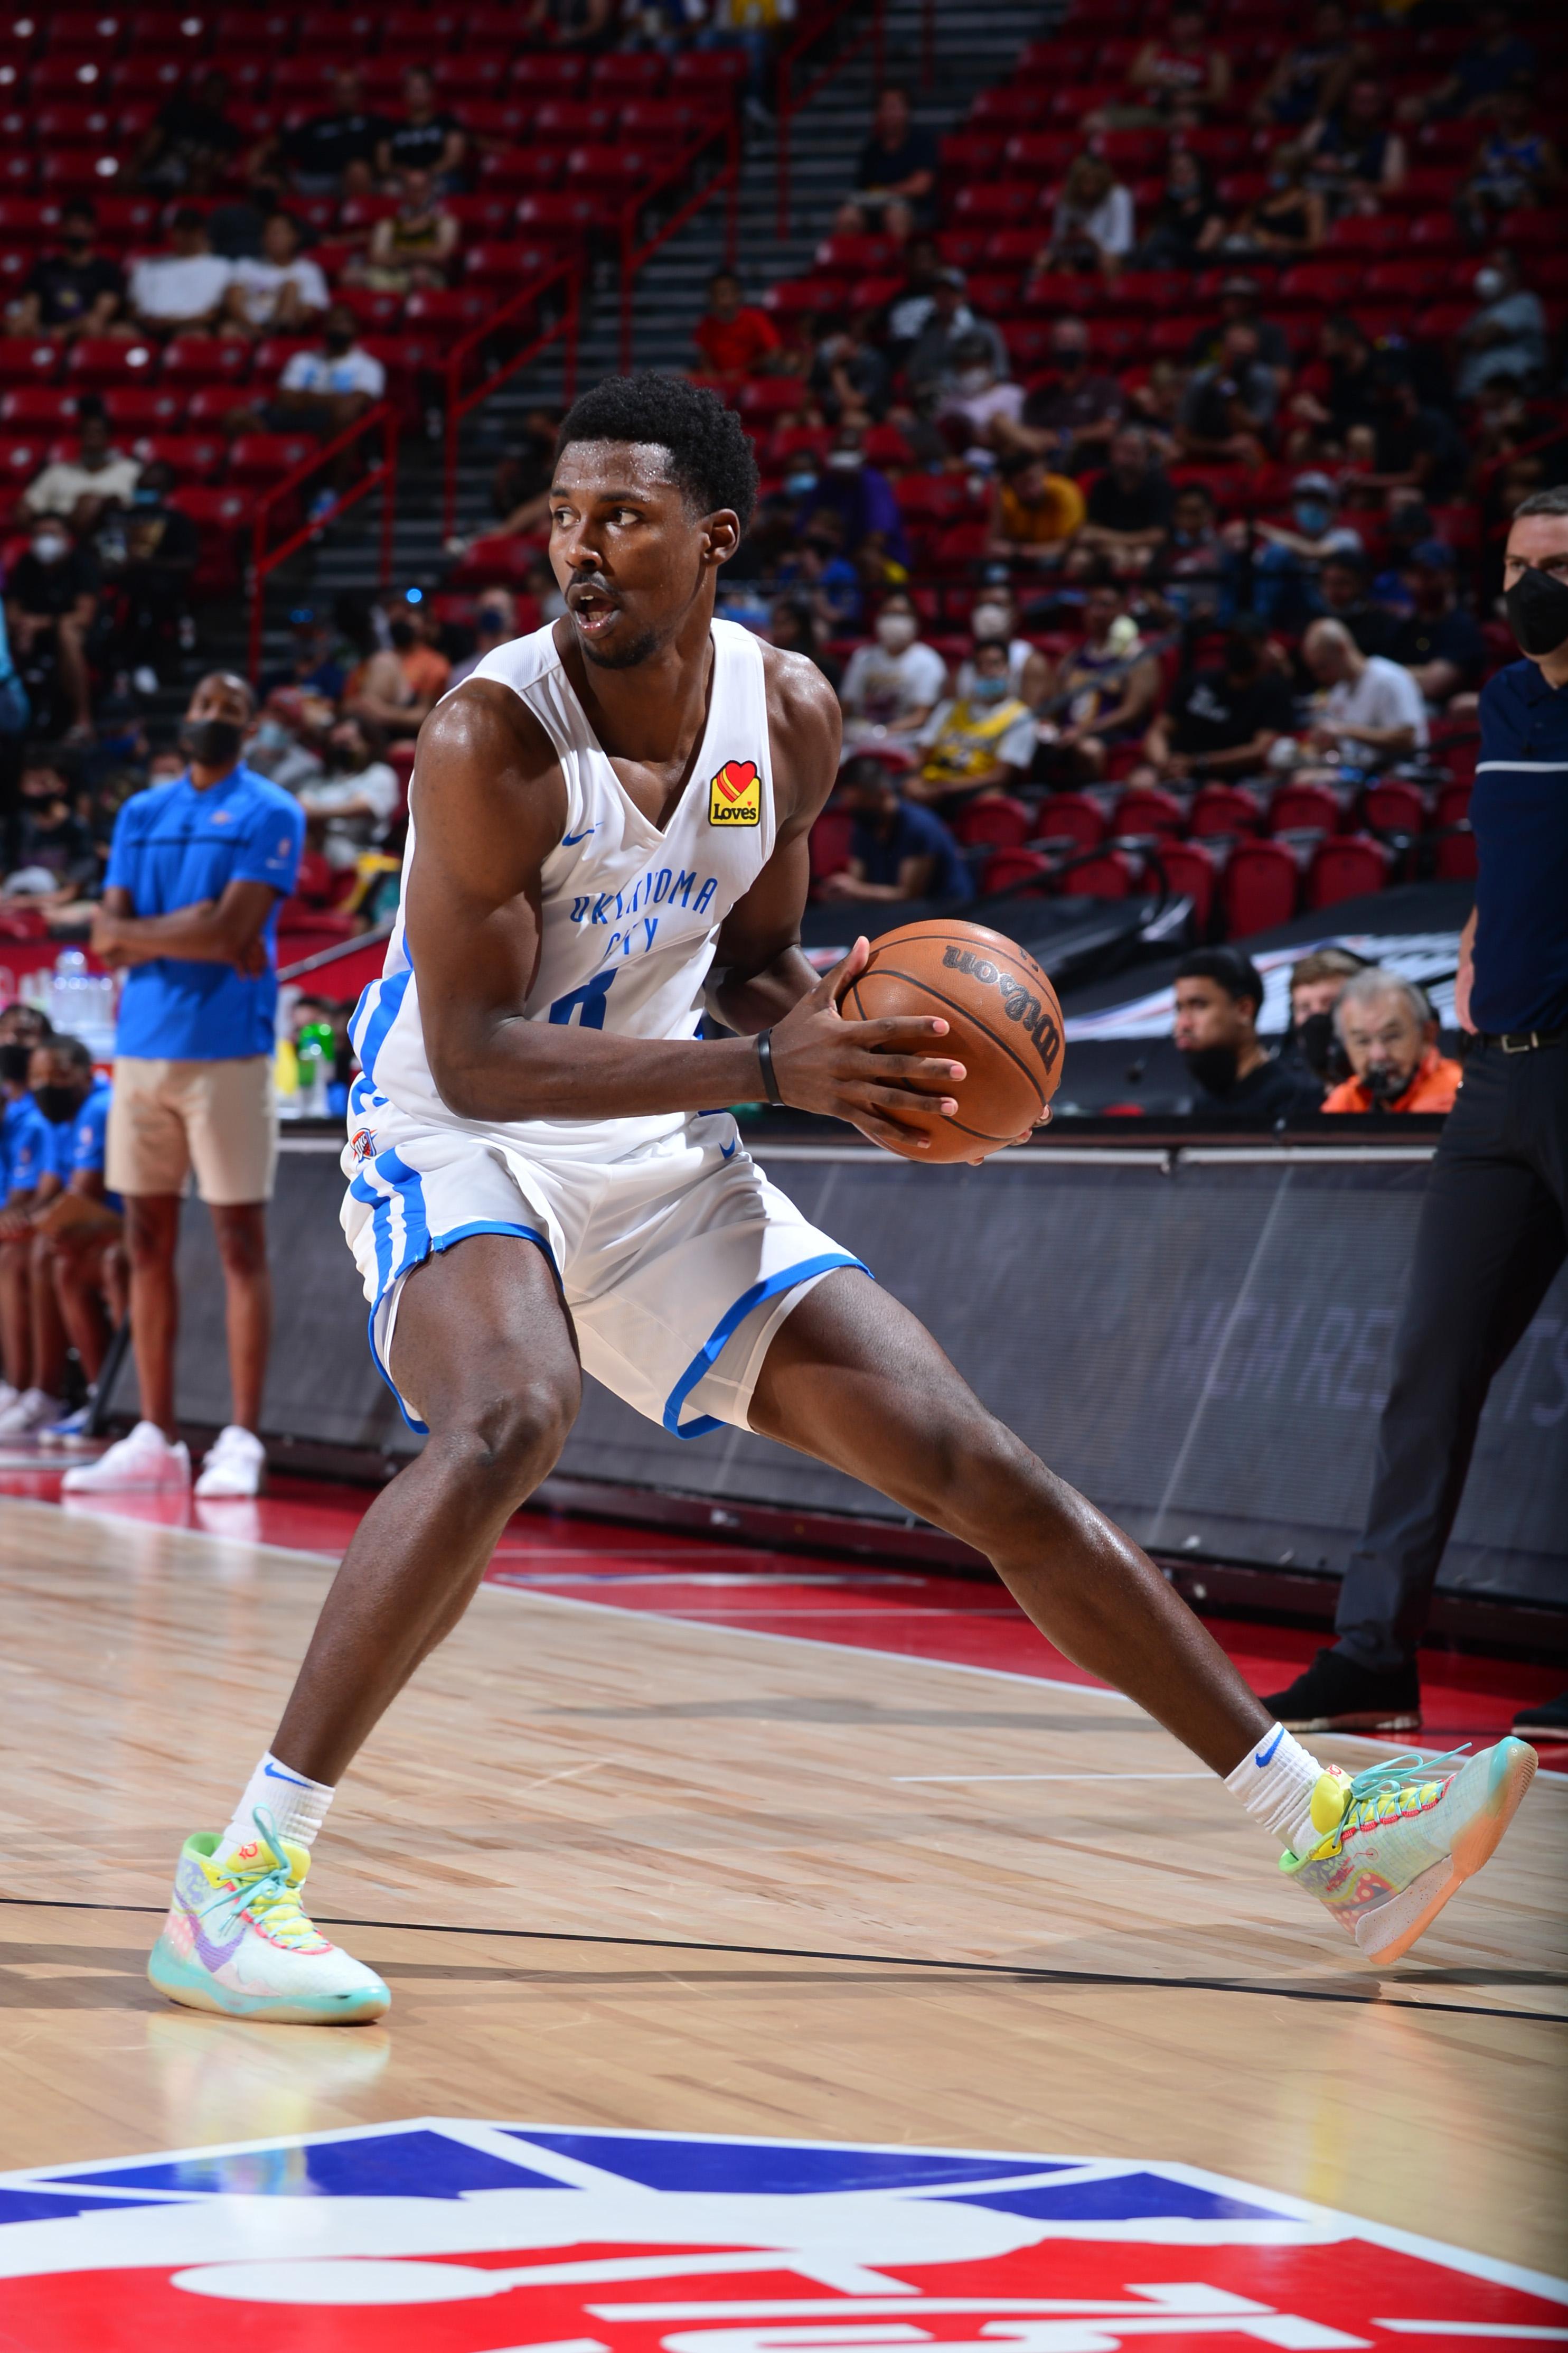 2021 Las Vegas Summer League - Indiana Pacers v Oklahoma City Thunder